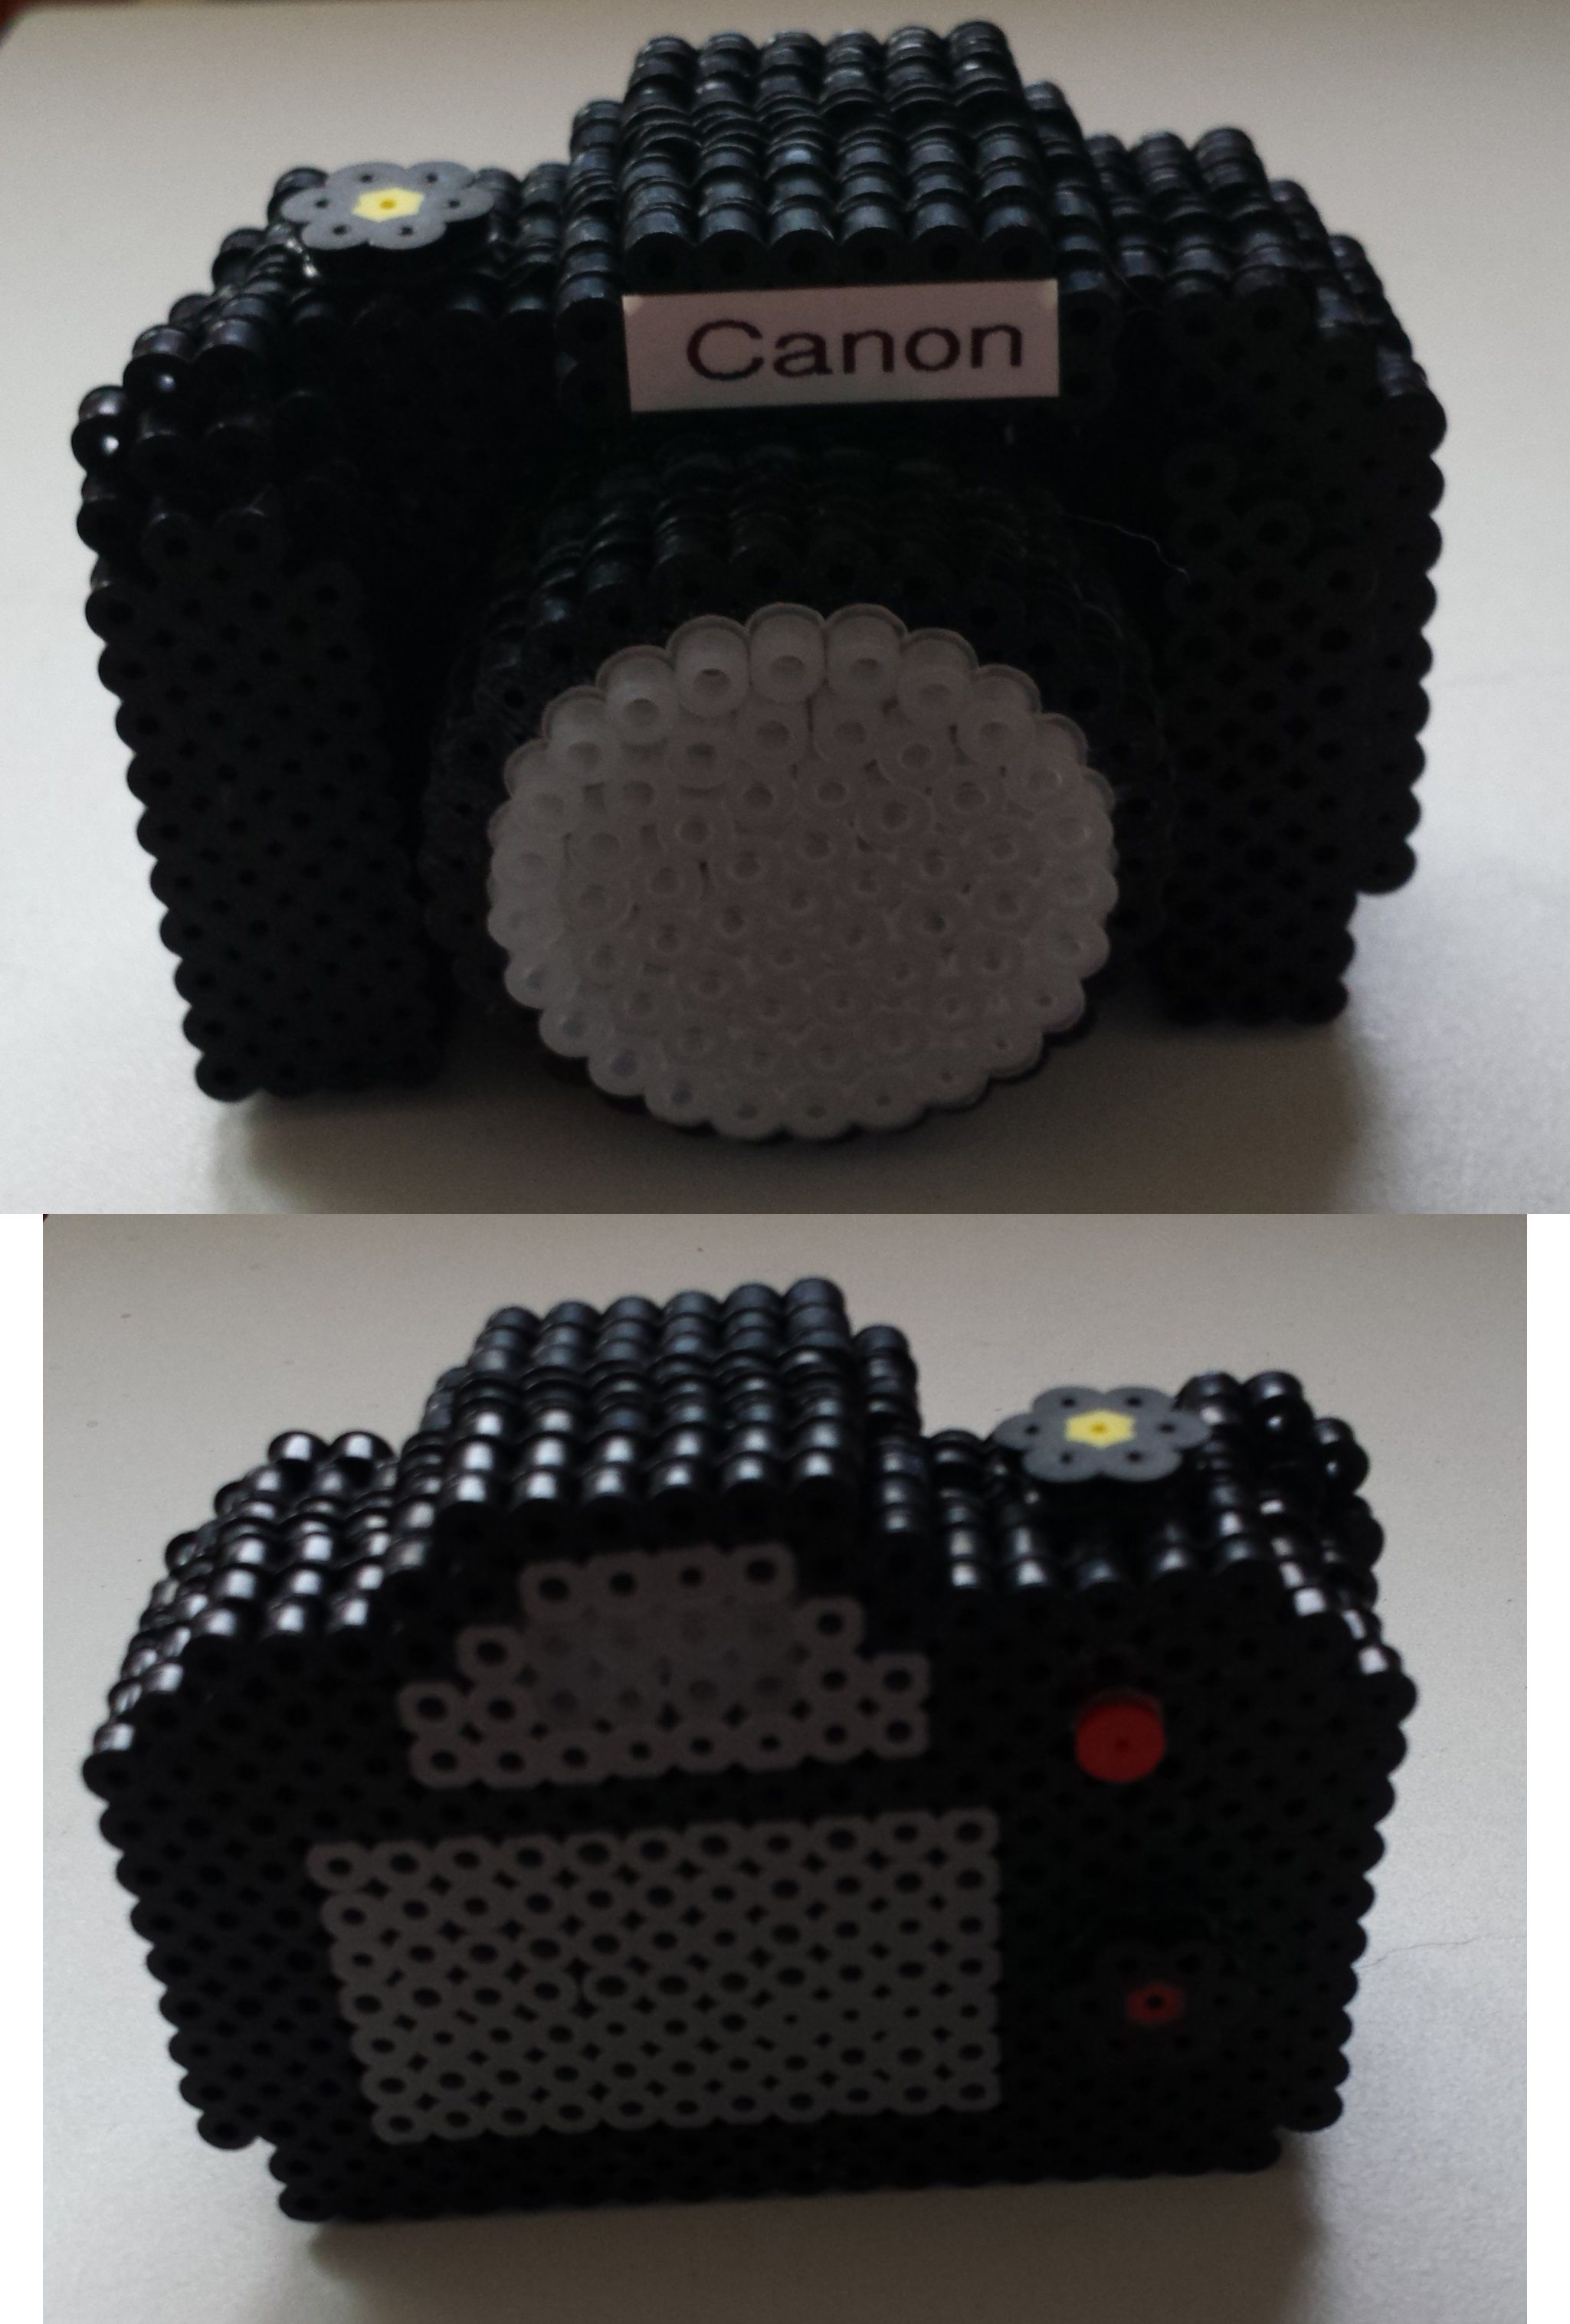 3D Canon Camera perler beads by Joanne Schiavoni | Hama Beads ...